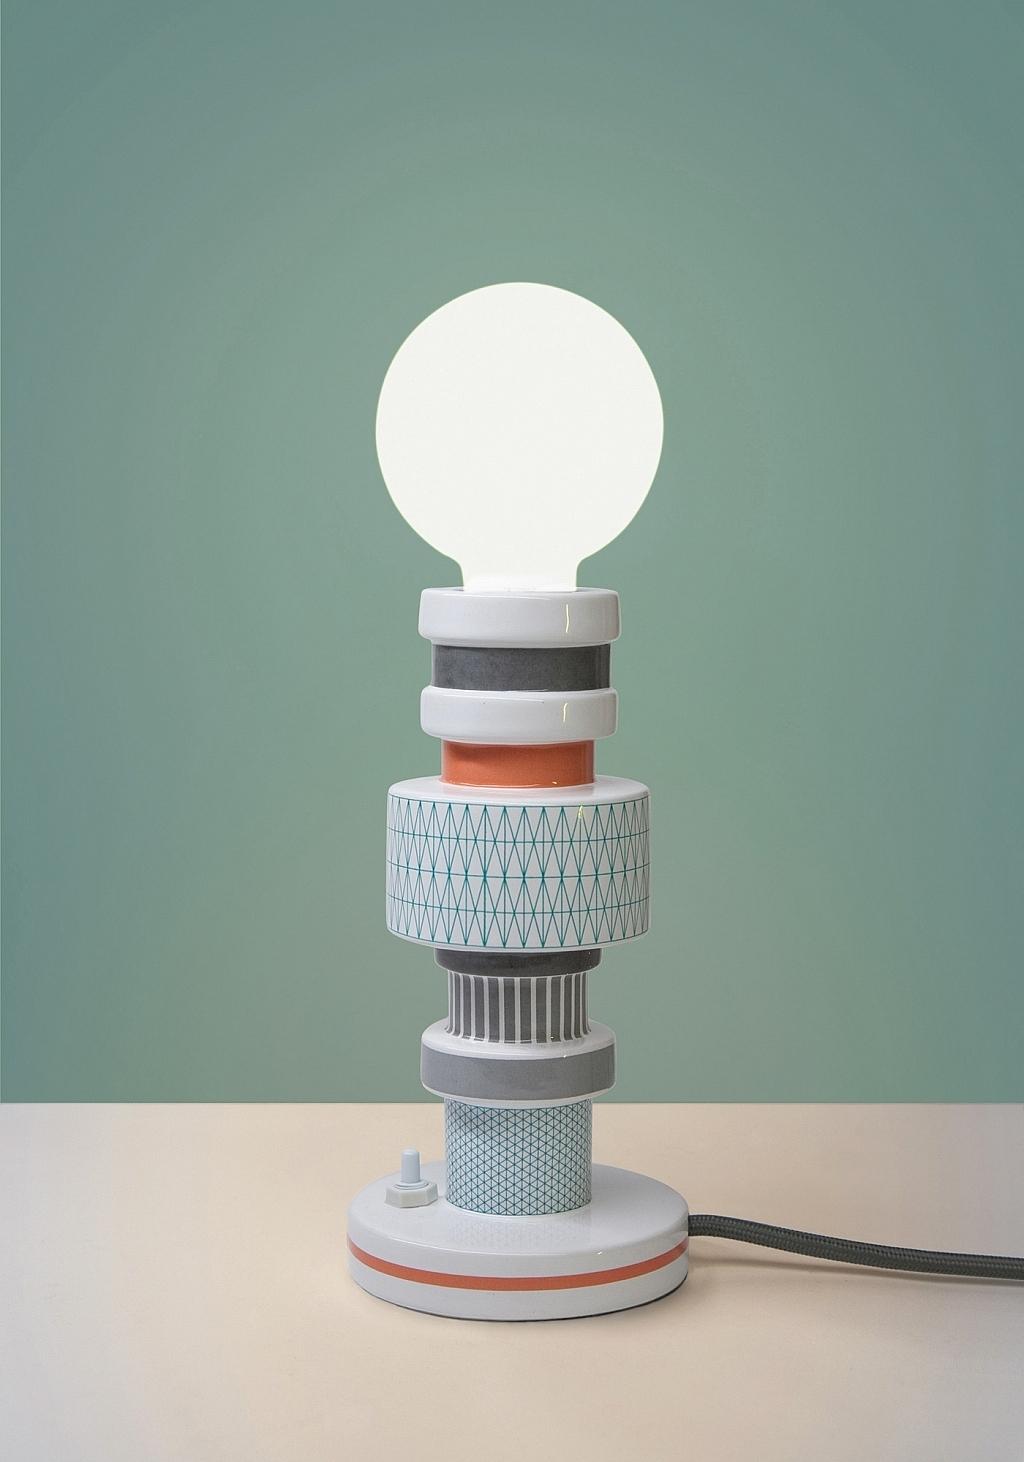 Seletti Moresque Table lamp-Turnot